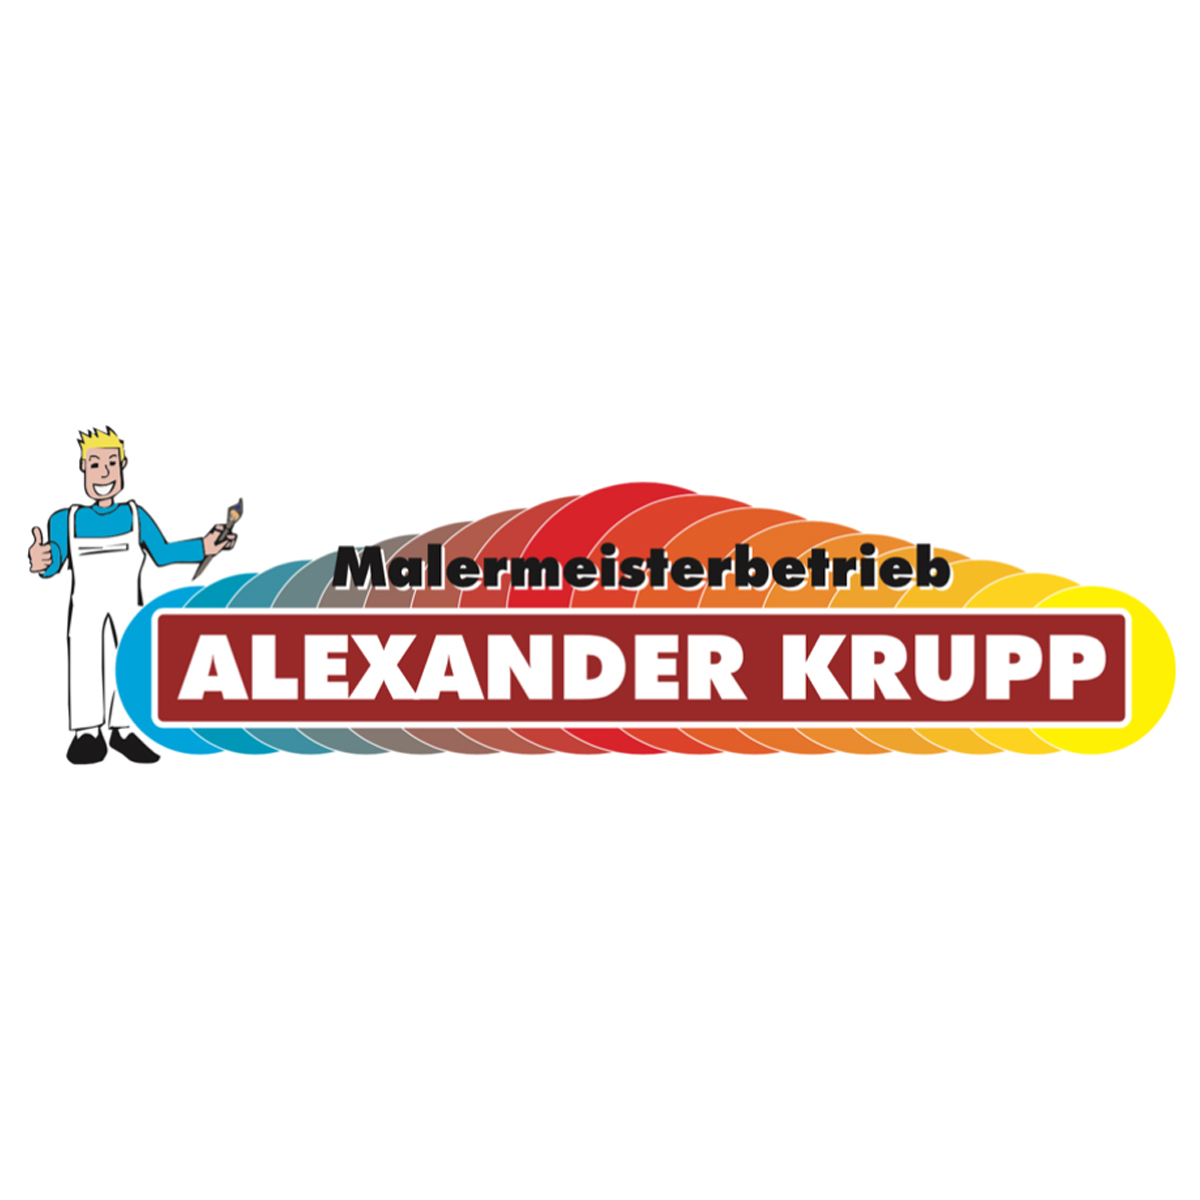 Malermeisterbetrieb Alexander Krupp